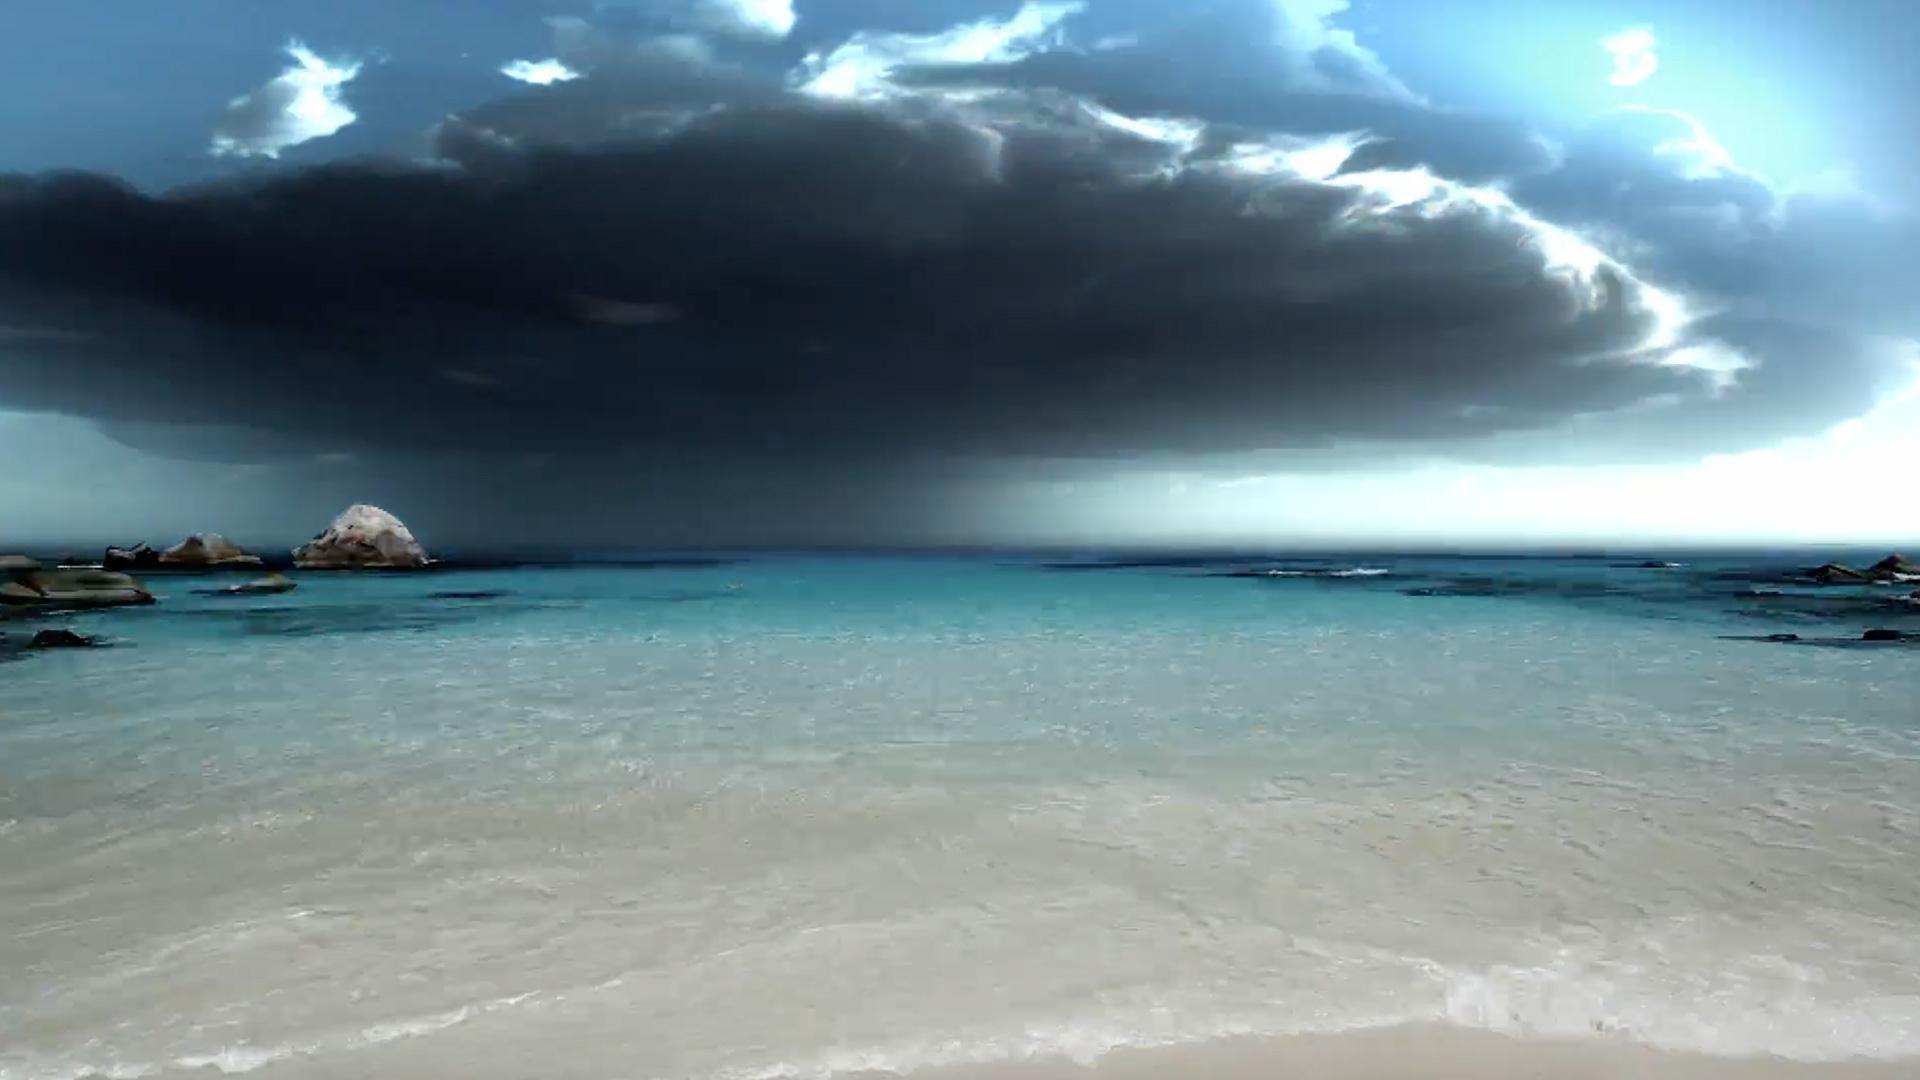 MTV HD Ex on the Beach Italia: What happened next